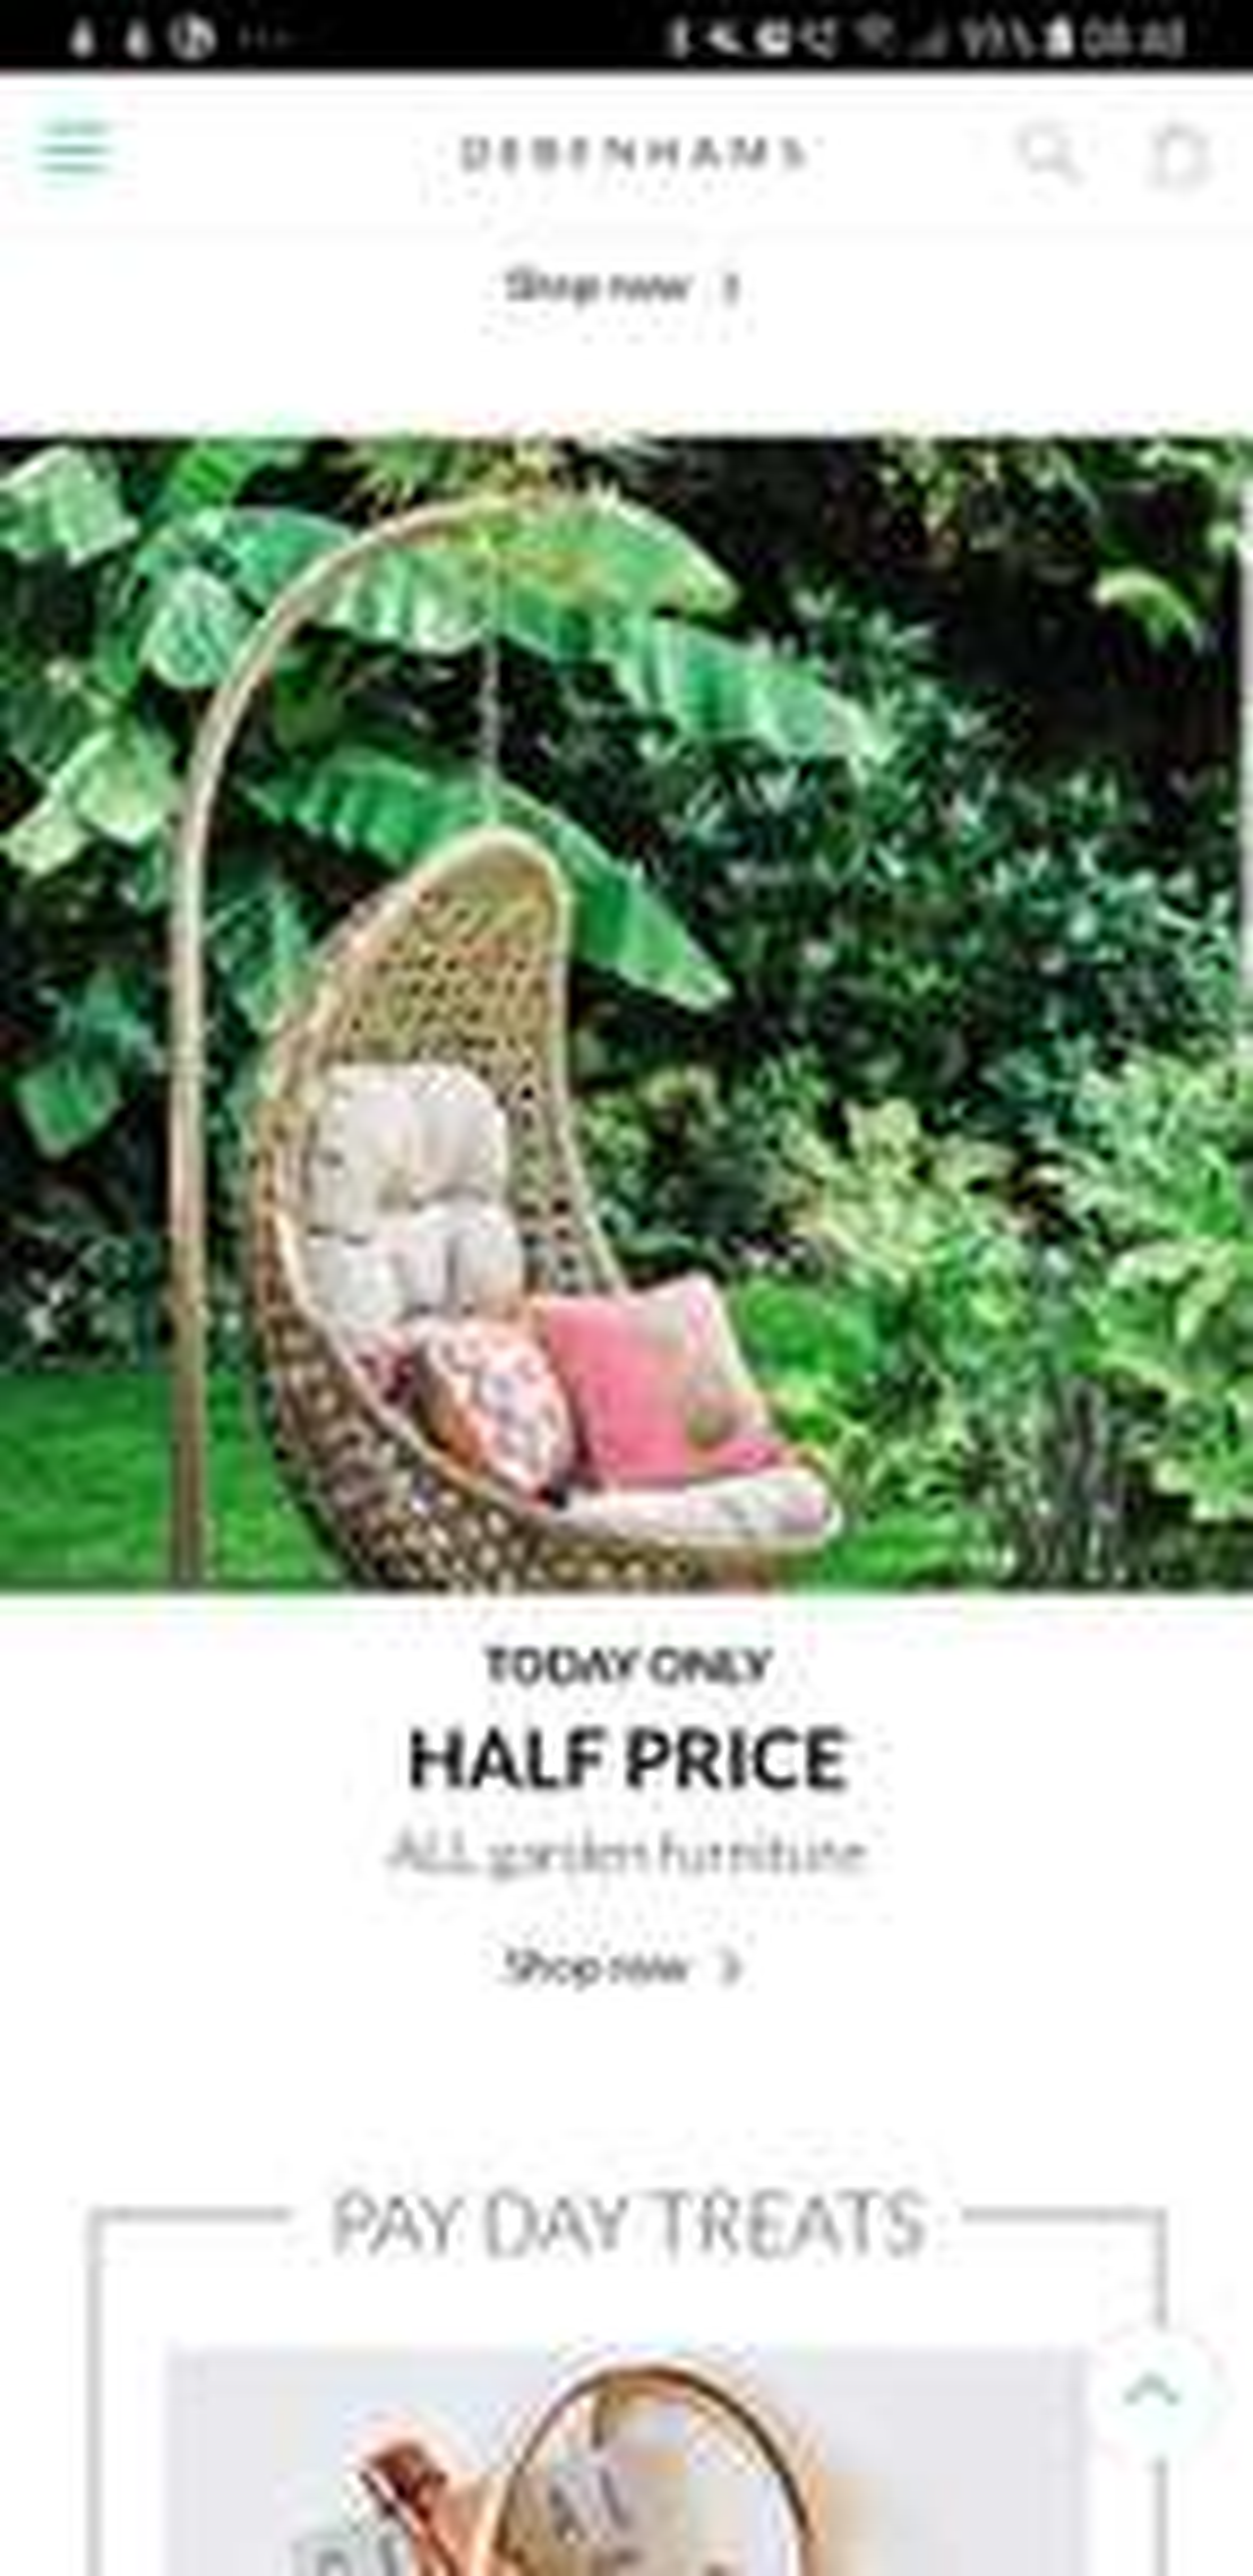 Half Price on all garden furniture at Debenhams